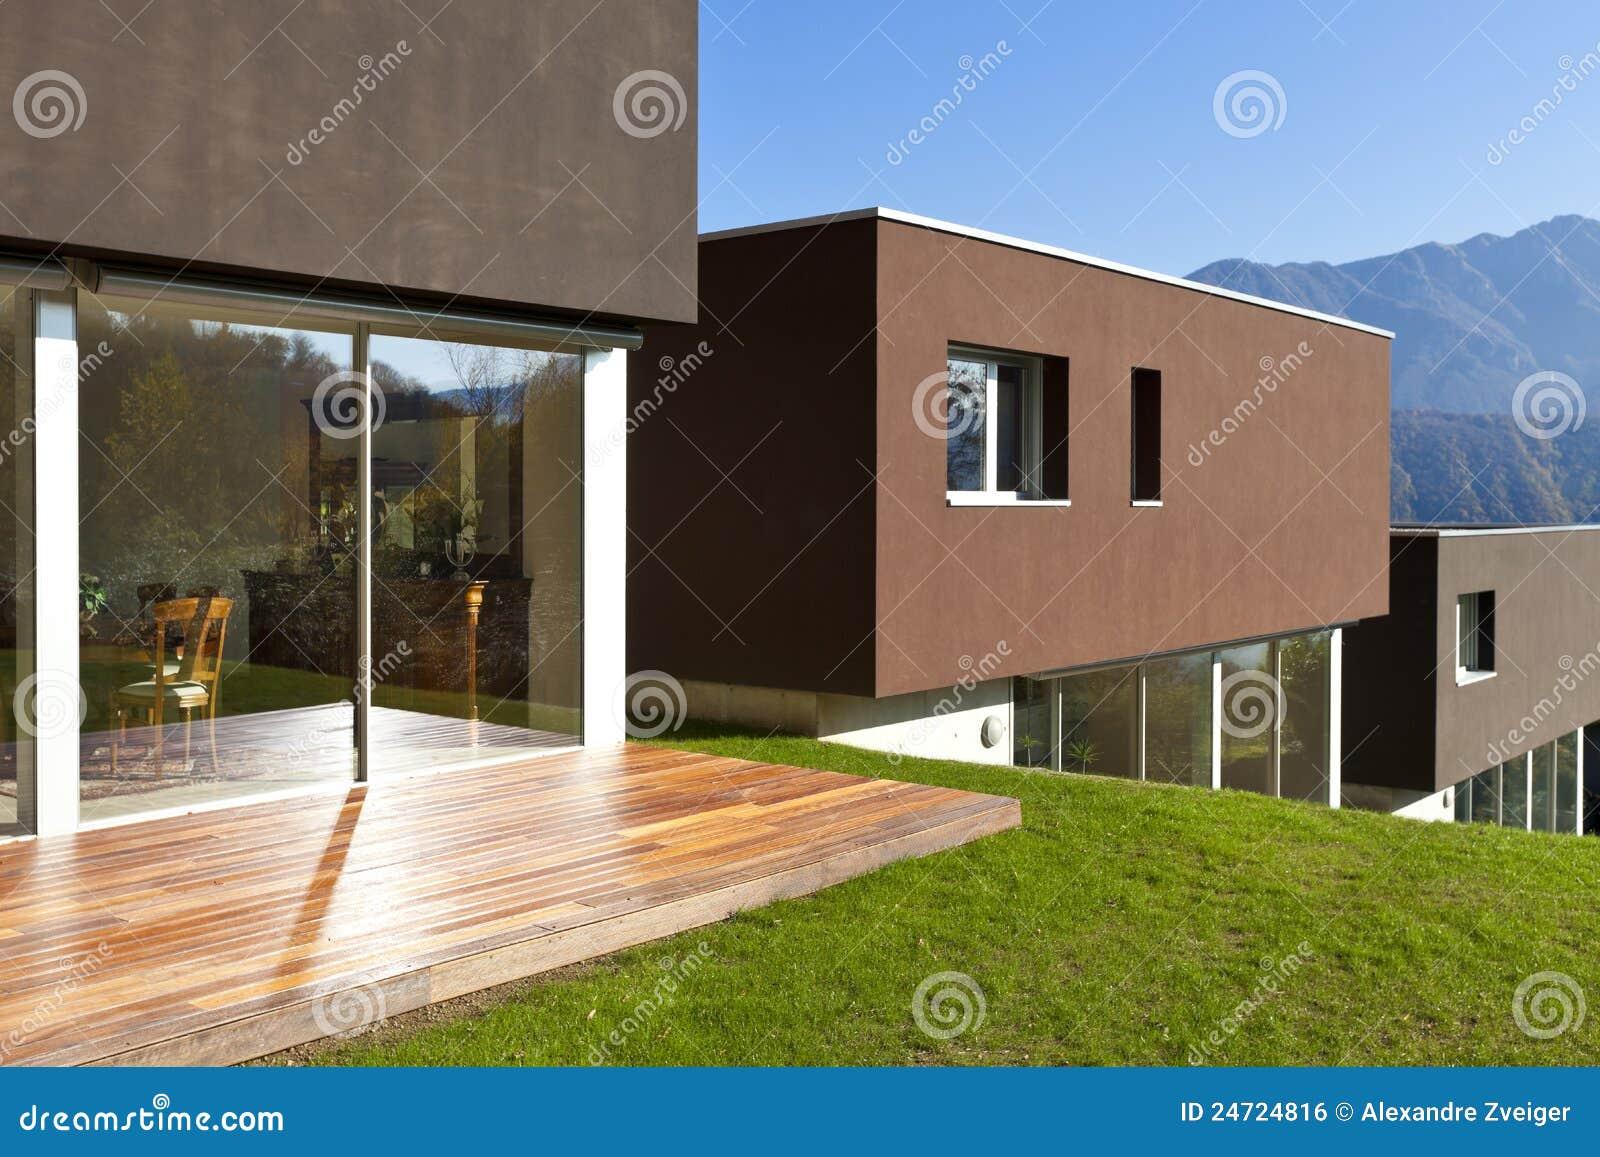 Case moderne esterni gallery of case moderne in bianco with case moderne esterni with case - Case moderne esterni ...